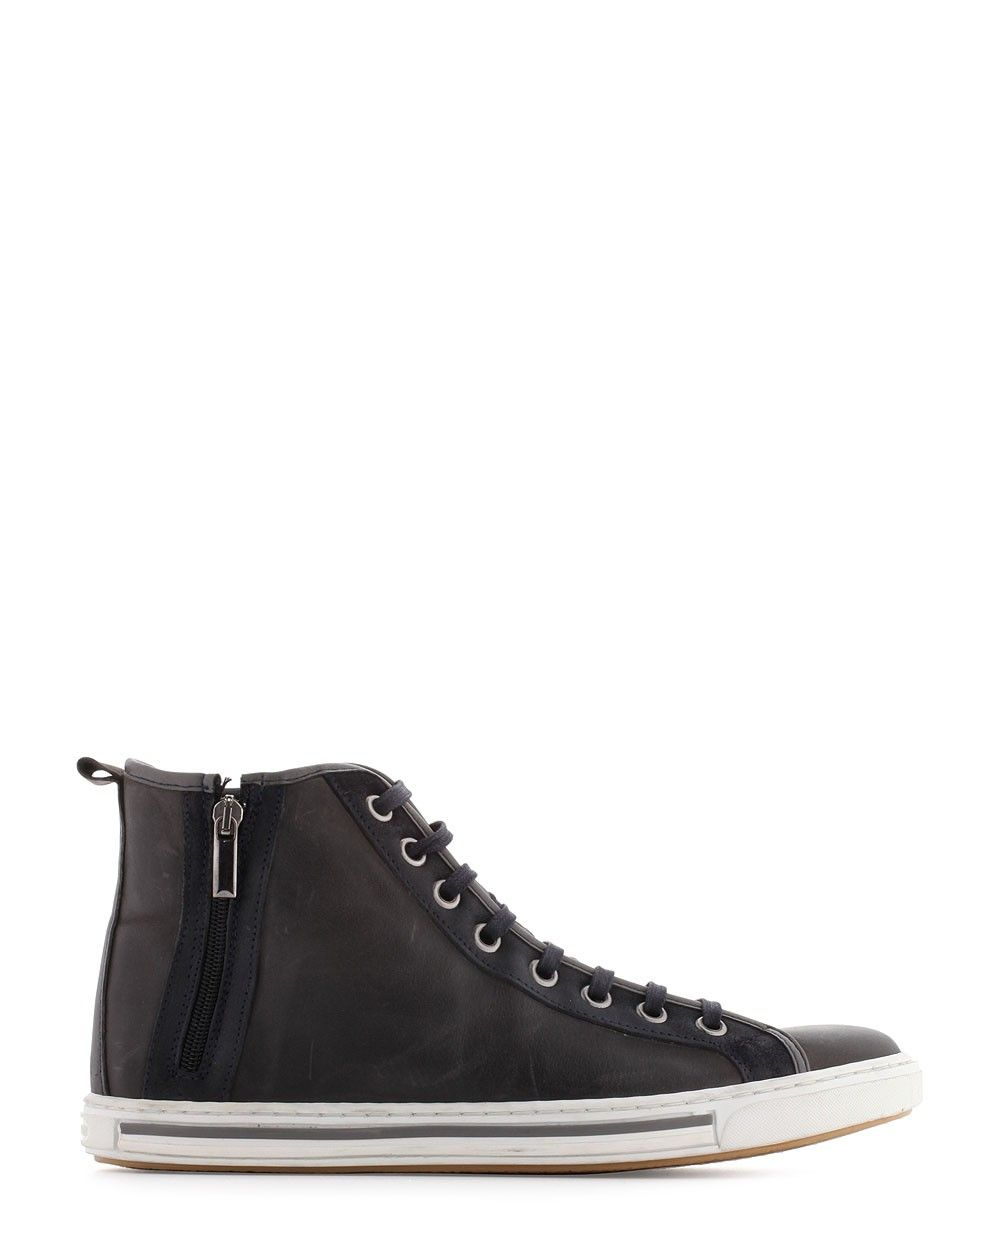 la meilleure attitude f29b6 fbf12 Sneakers - Borbillo - Boots - Chaussures Homme Automne Hiver ...